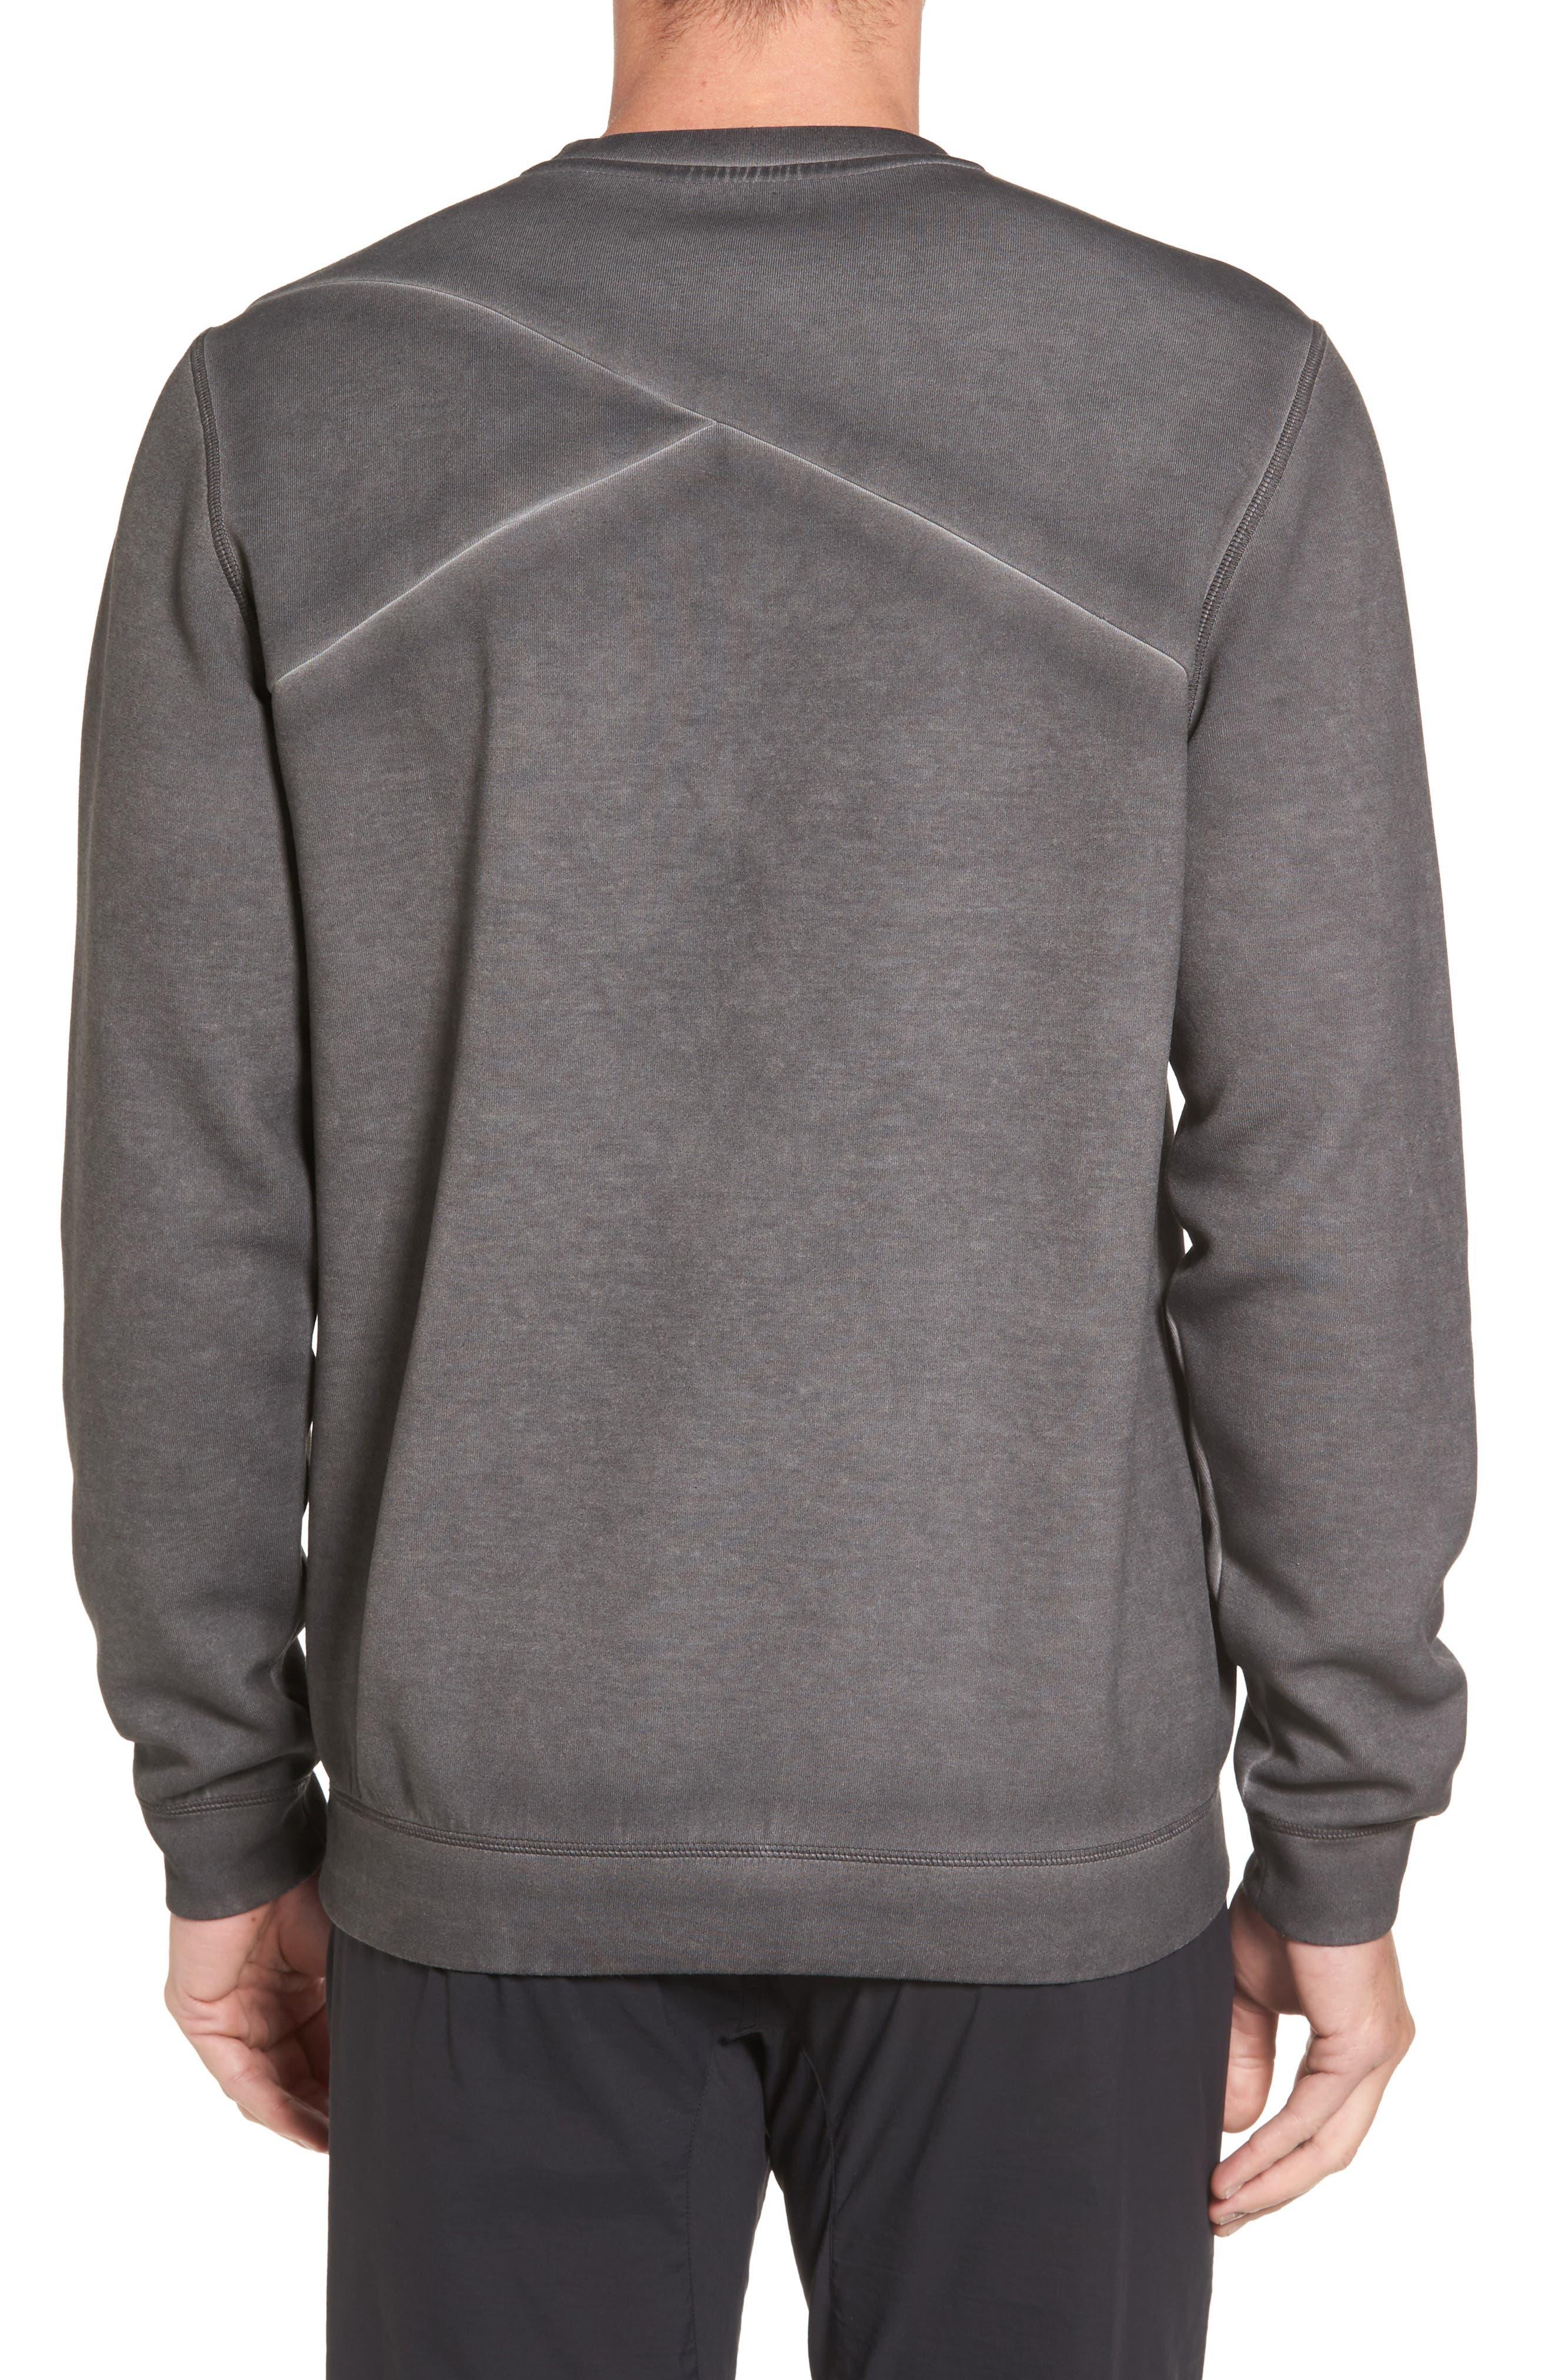 Dirty Wash Sweatshirt,                             Alternate thumbnail 2, color,                             040